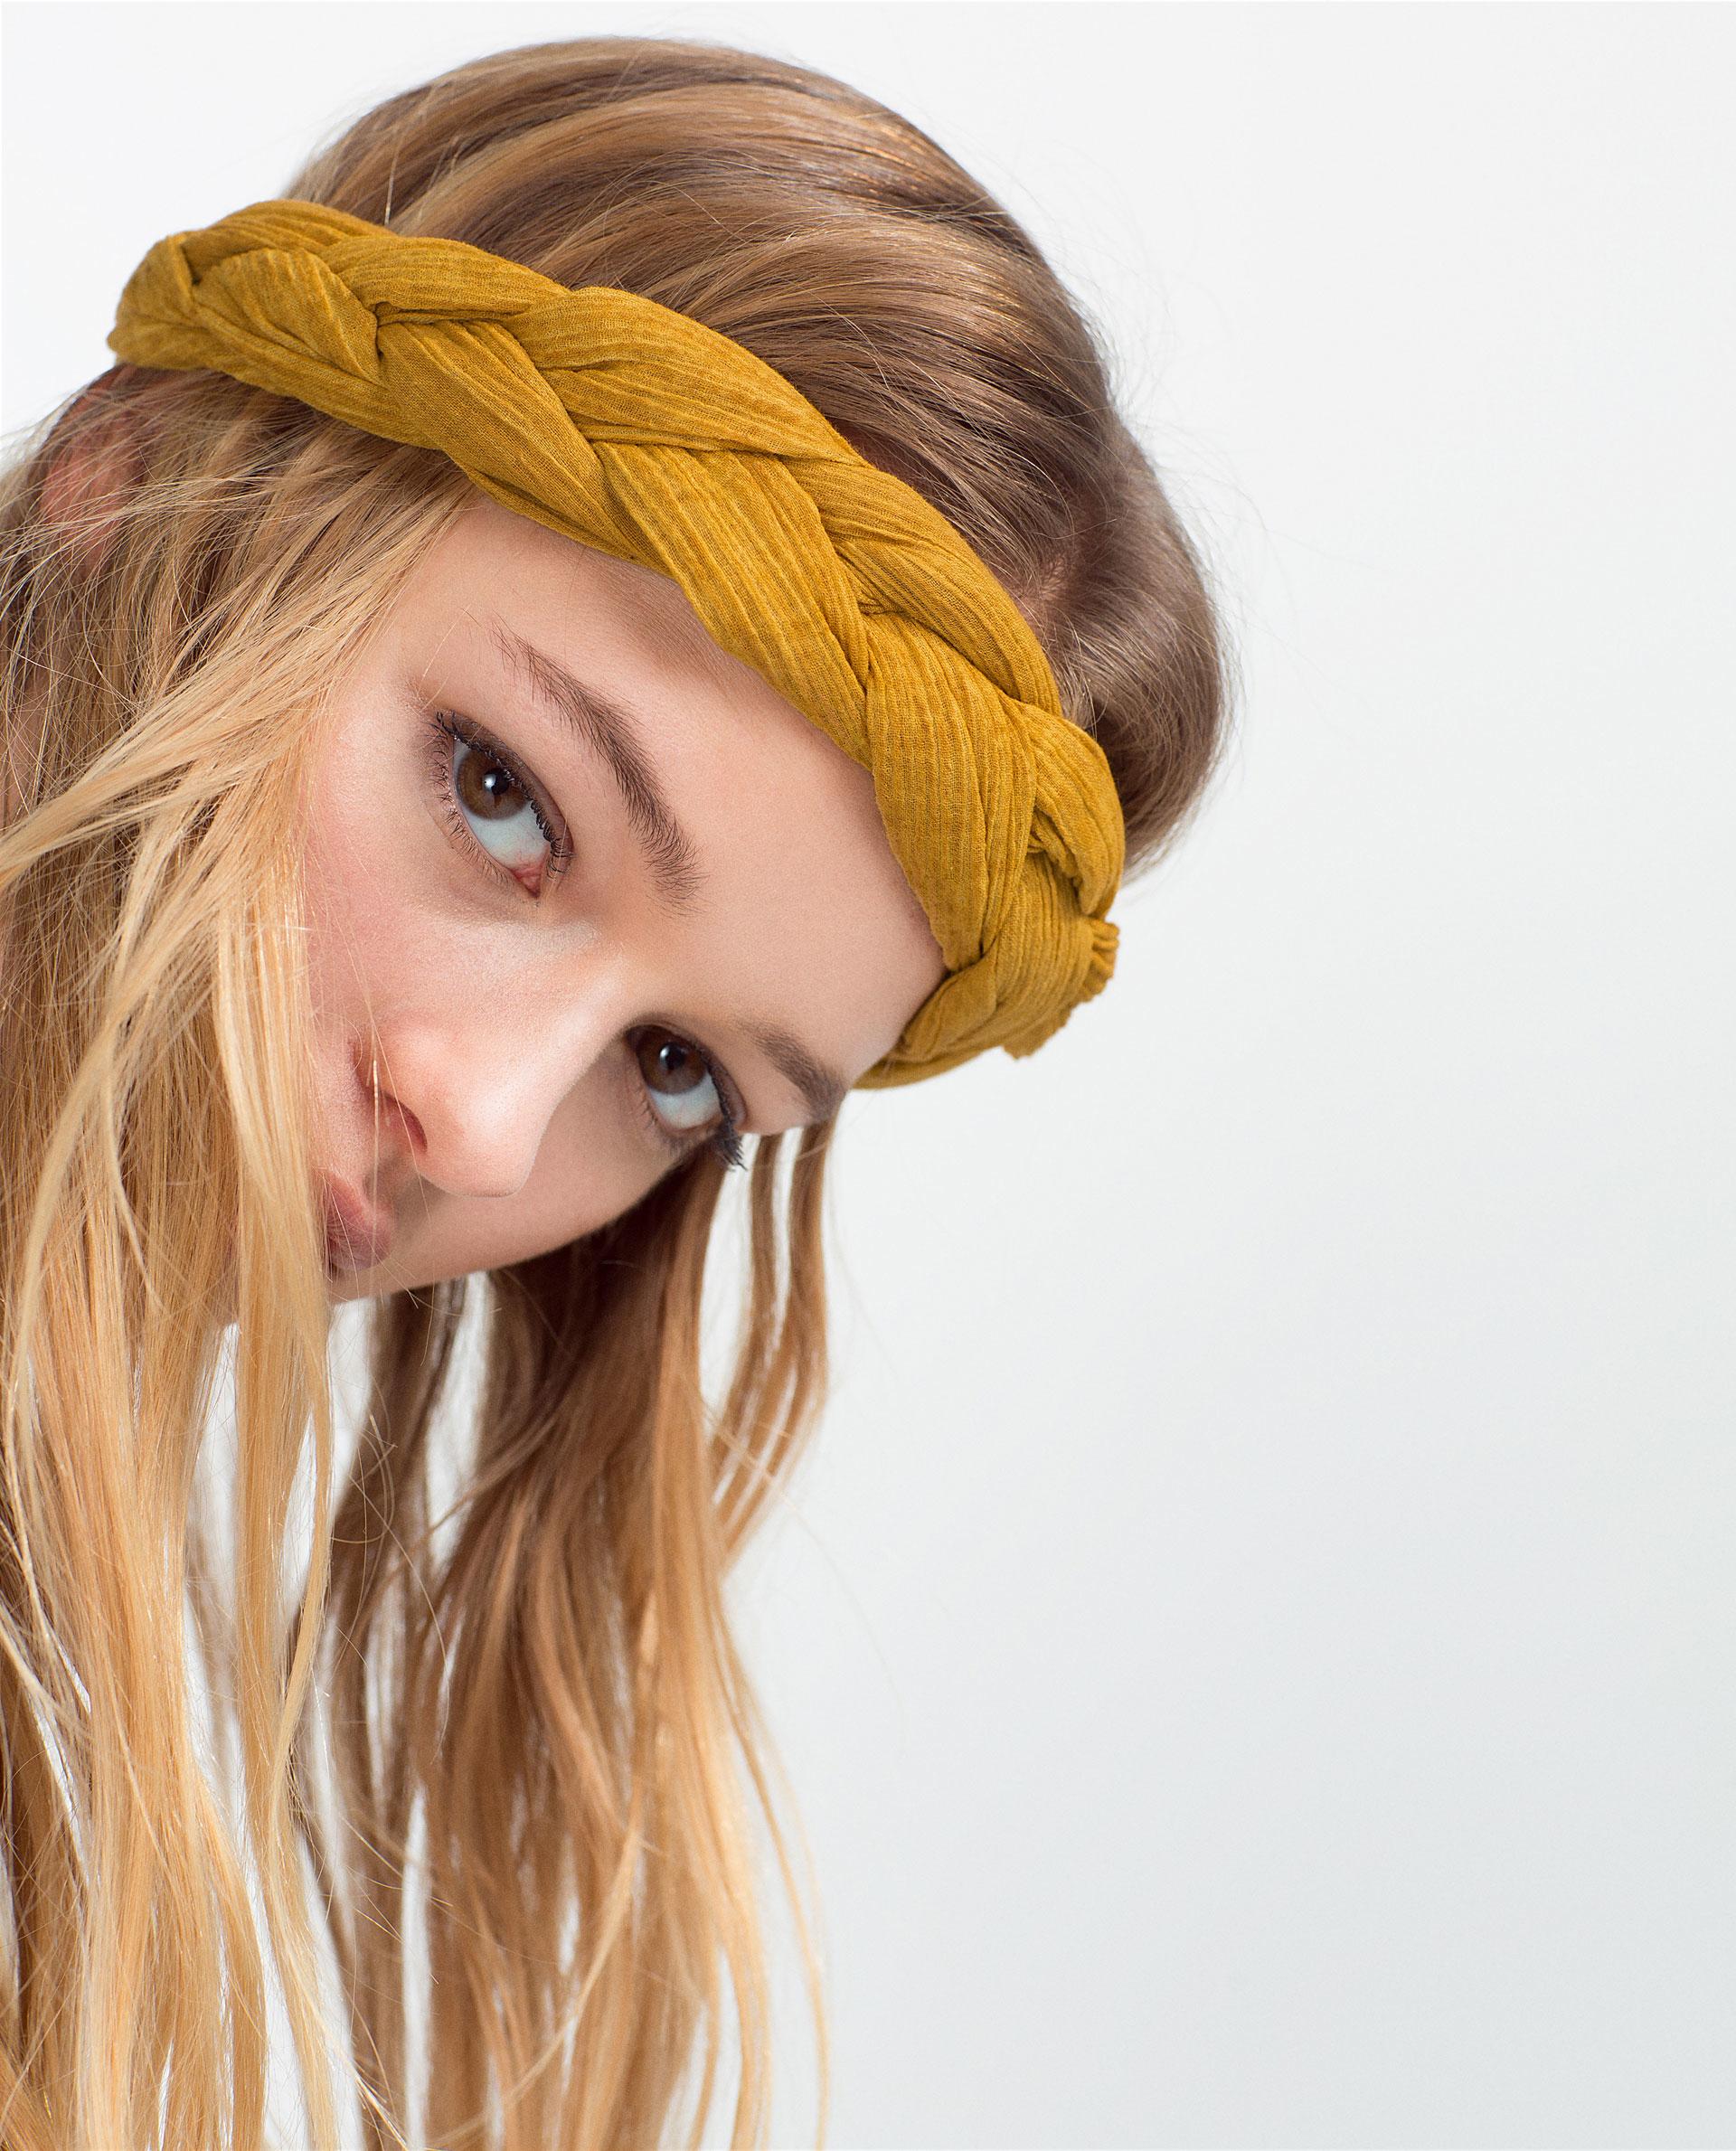 Zara baby hair accessories - Gallery Download Image Zara Baby Hair Accessories